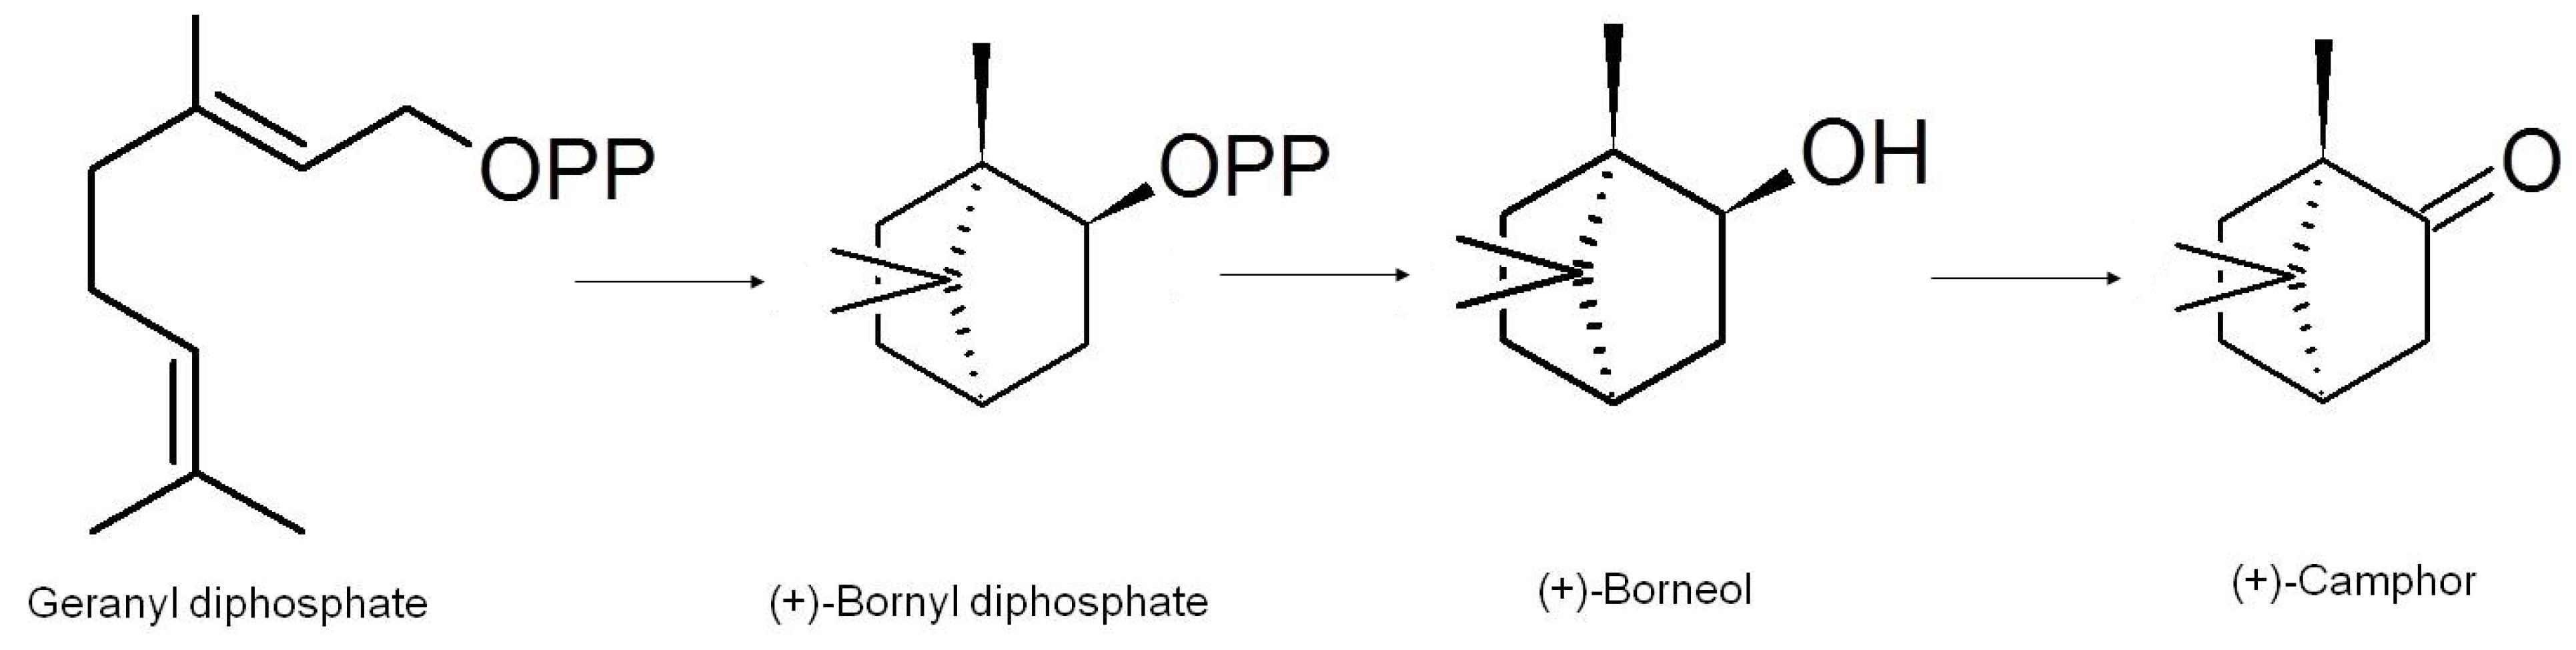 Molecules | Free Full-Text | Camphor—A Fumigant during the